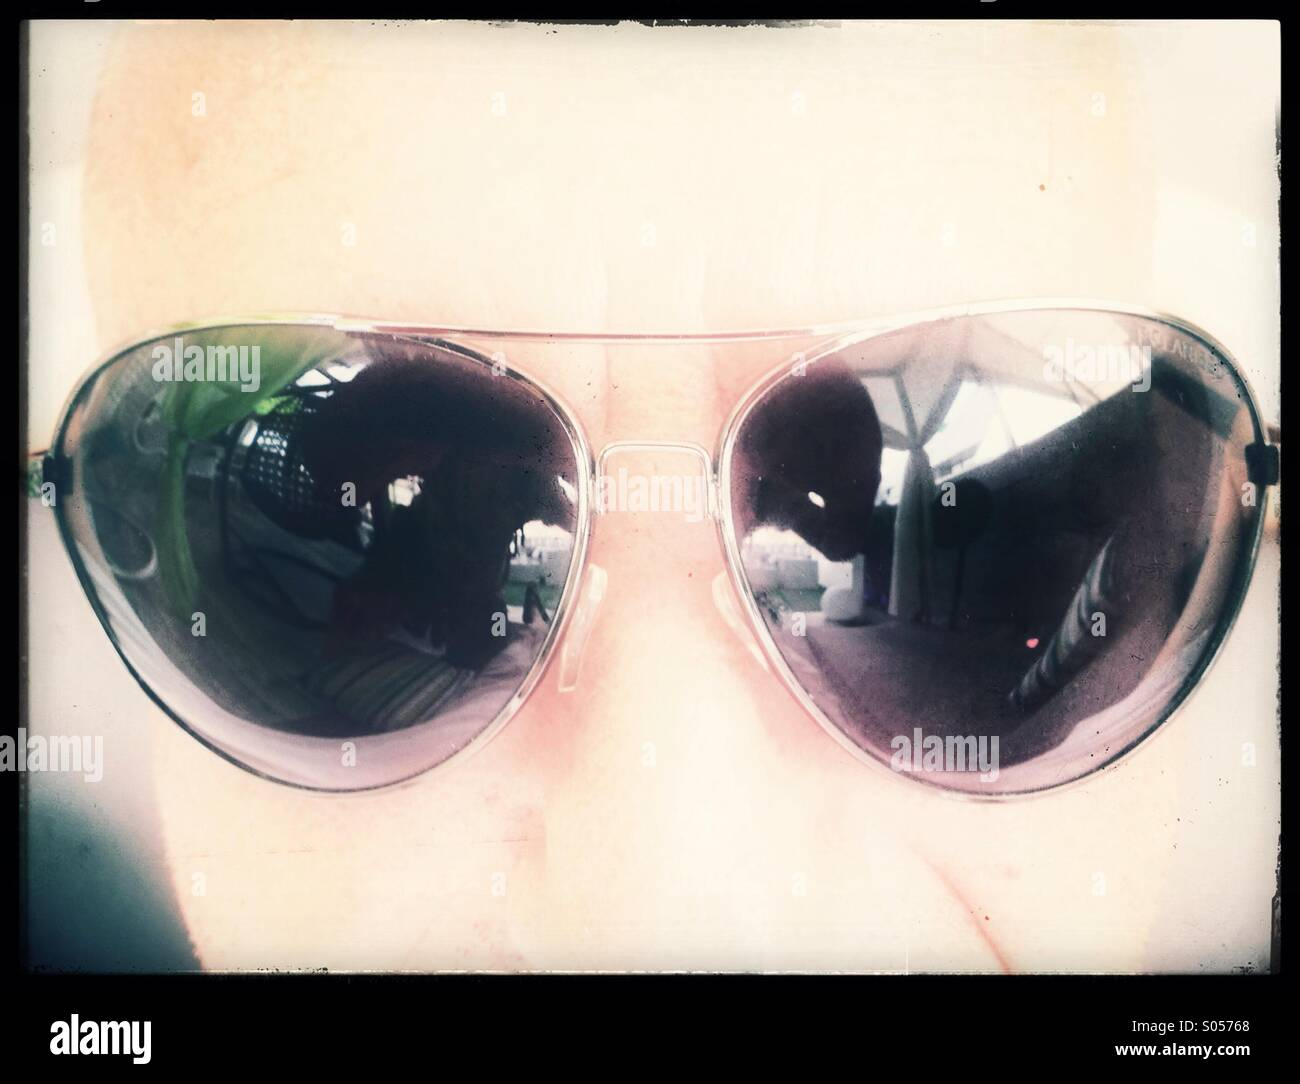 Man's face wearing dark glasses. - Stock Image